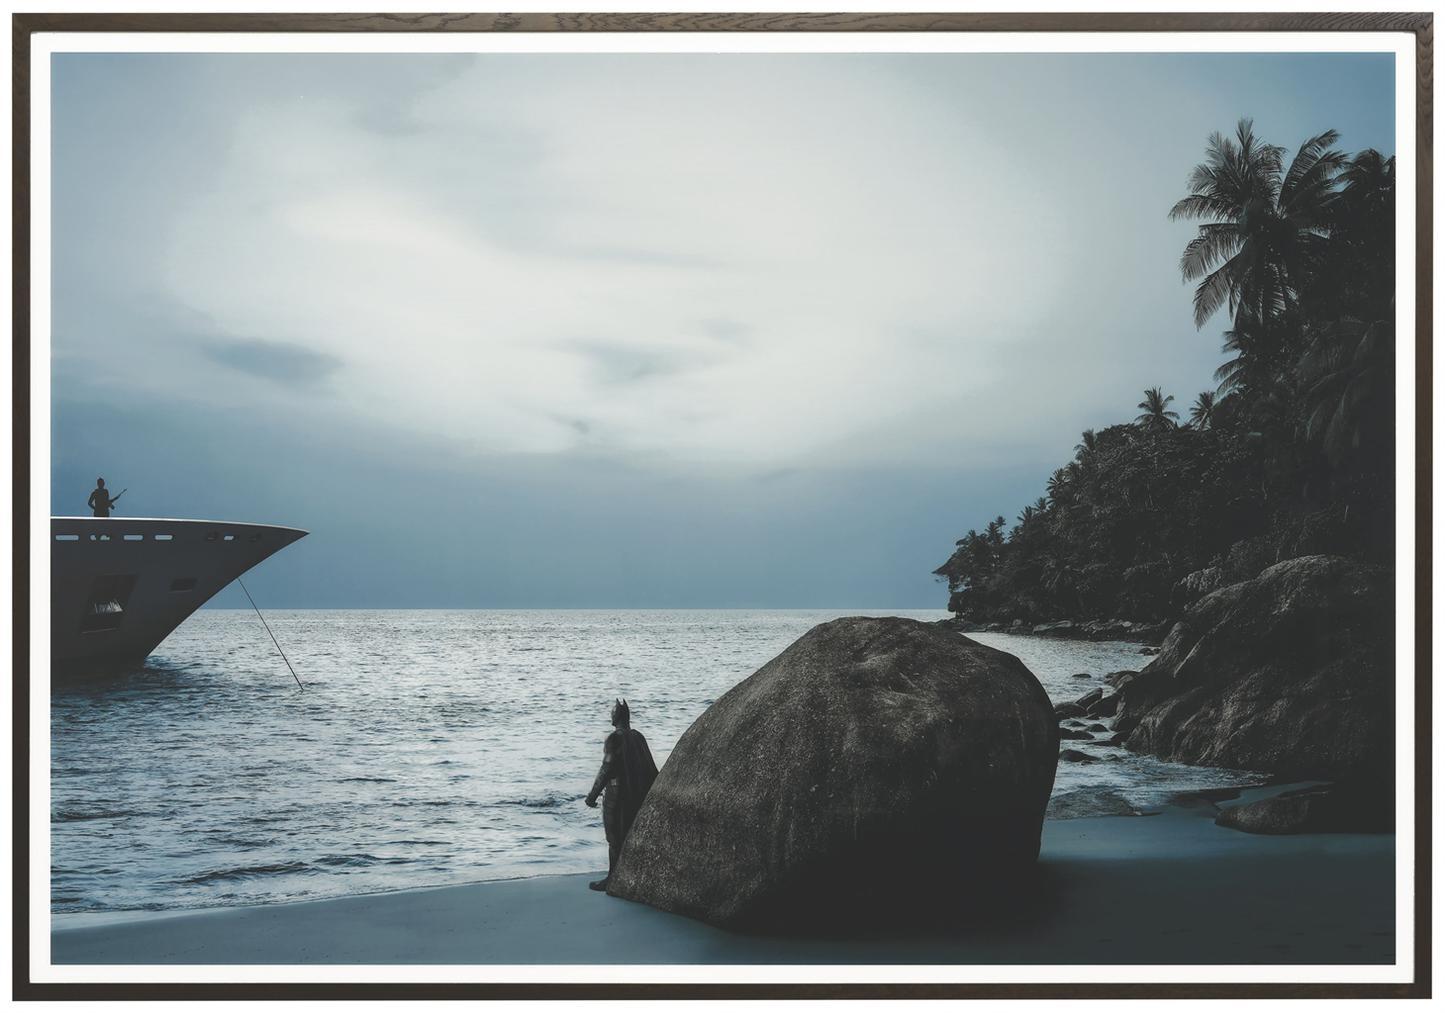 Andreas Gursky-Sh III-2014